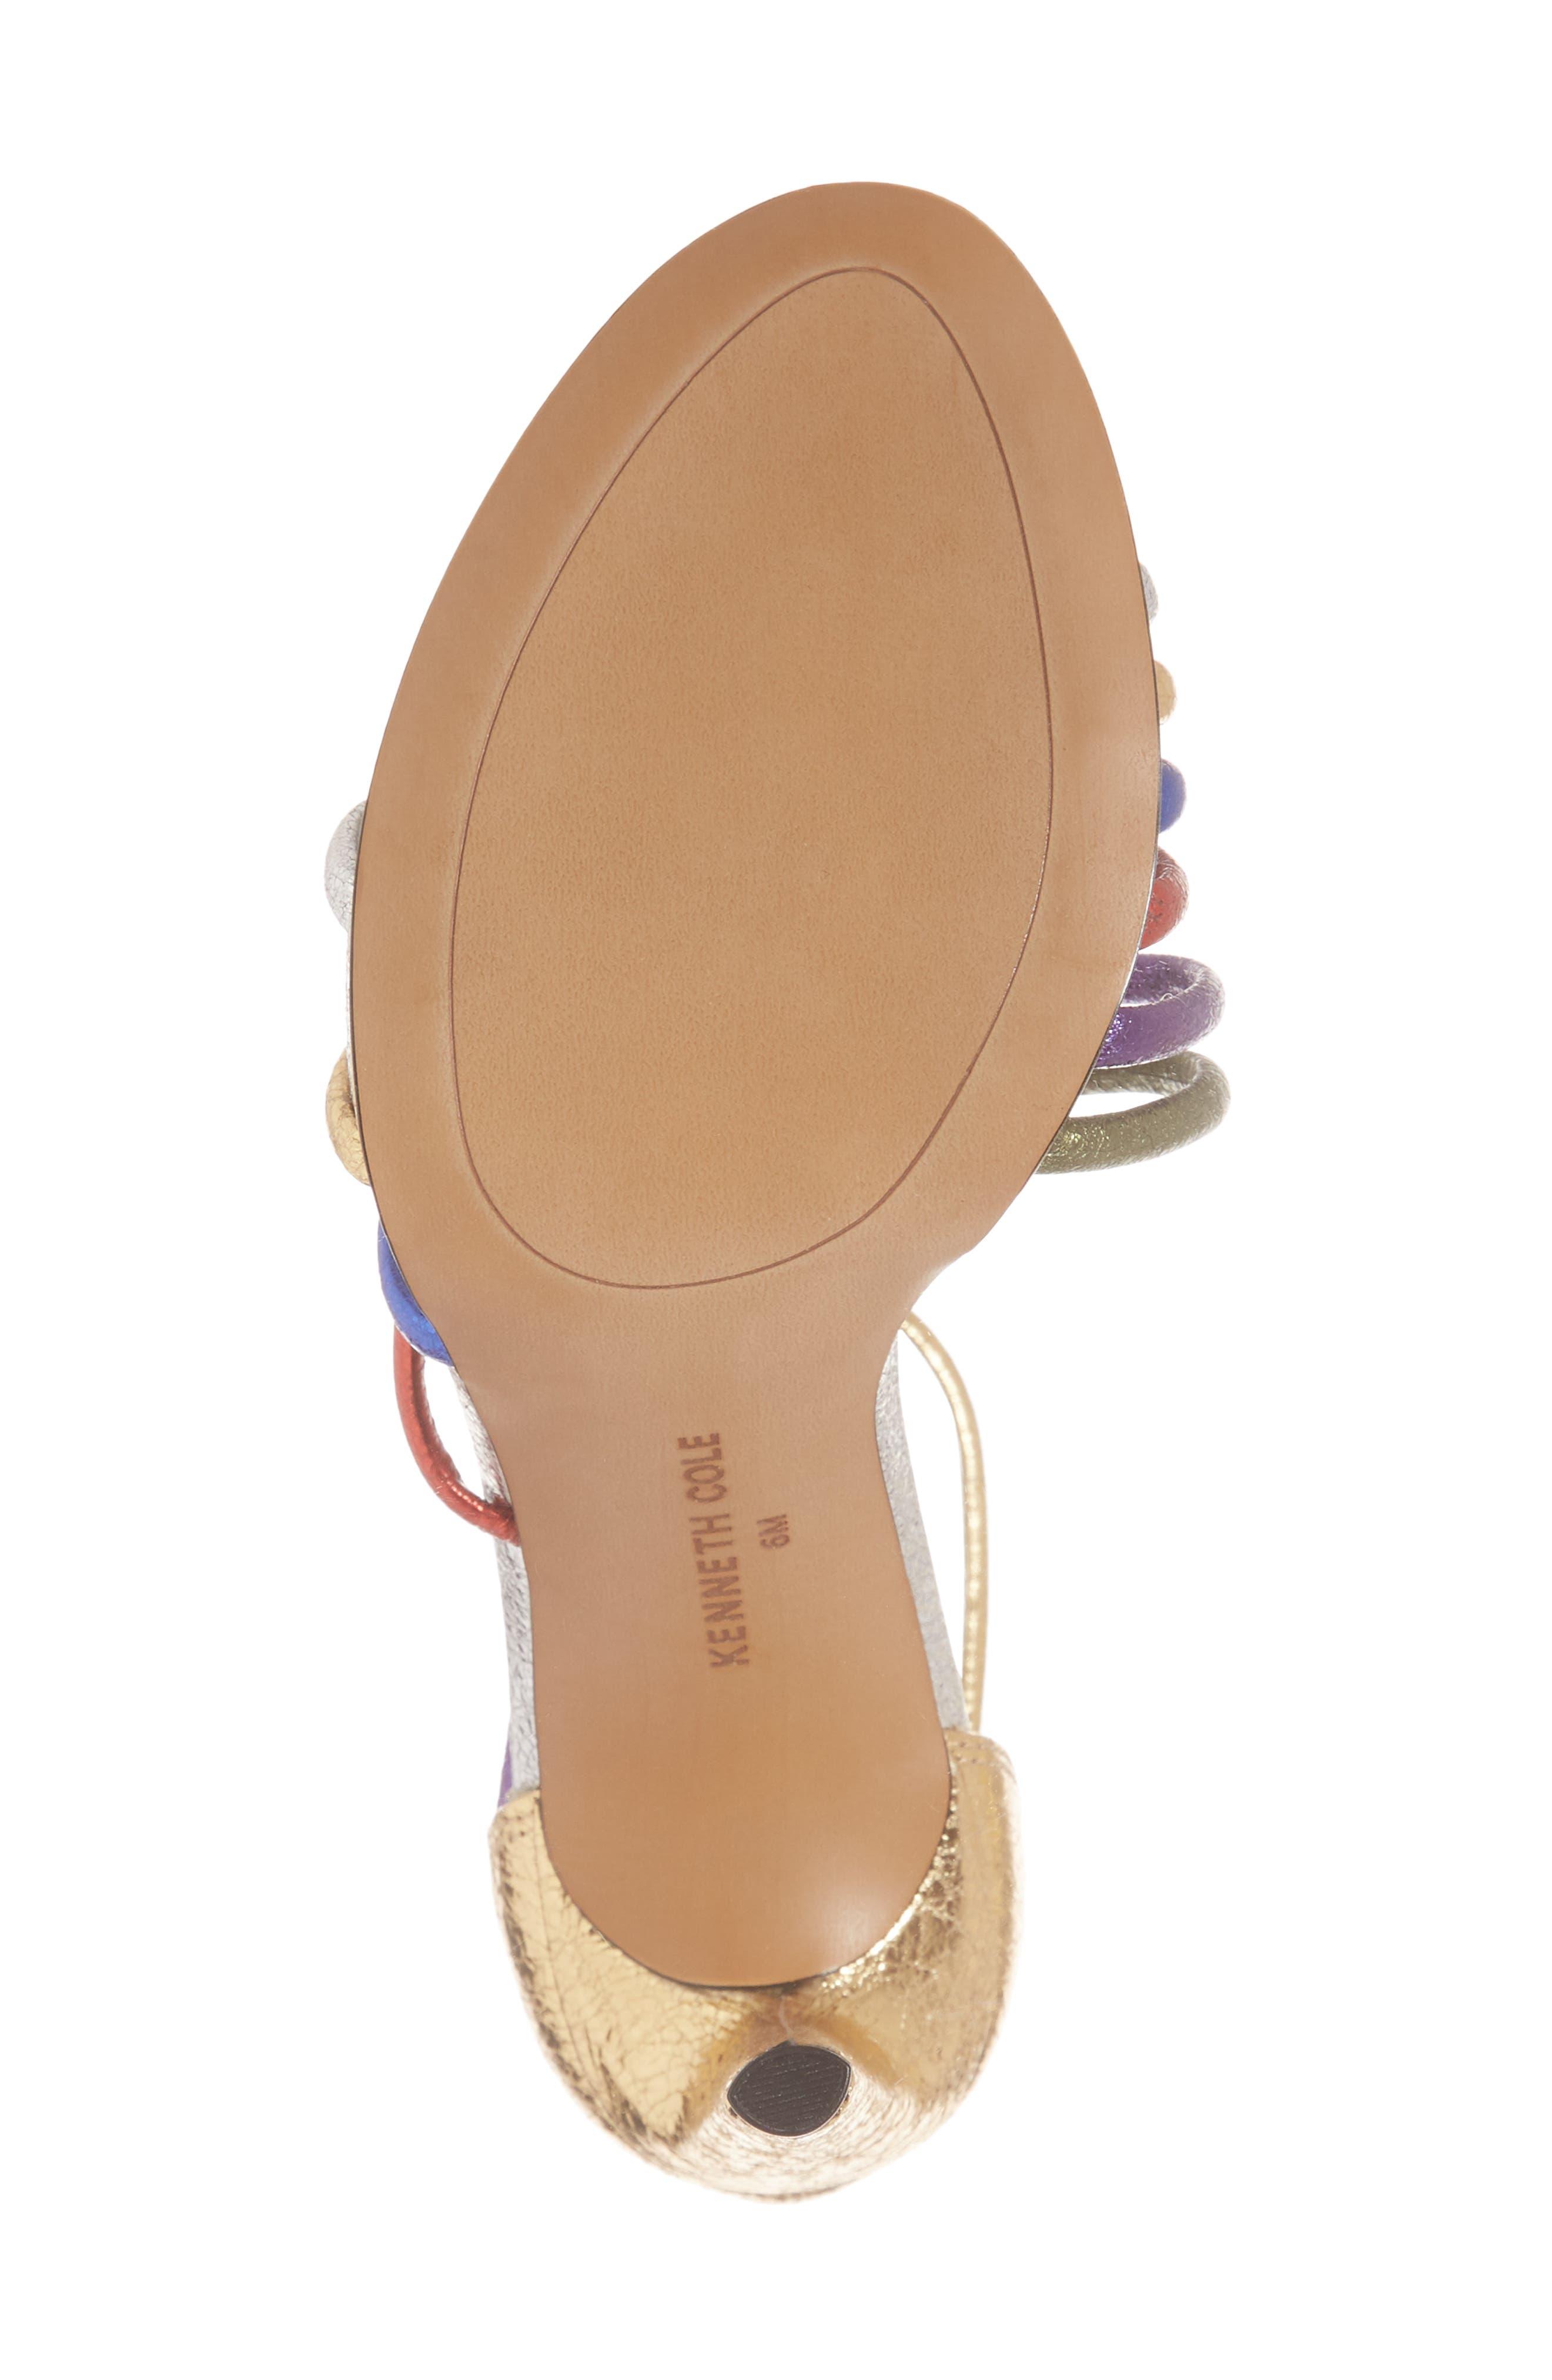 Barletta Asymmetrical Strappy Sandal,                             Alternate thumbnail 6, color,                             MULTI LEATHER